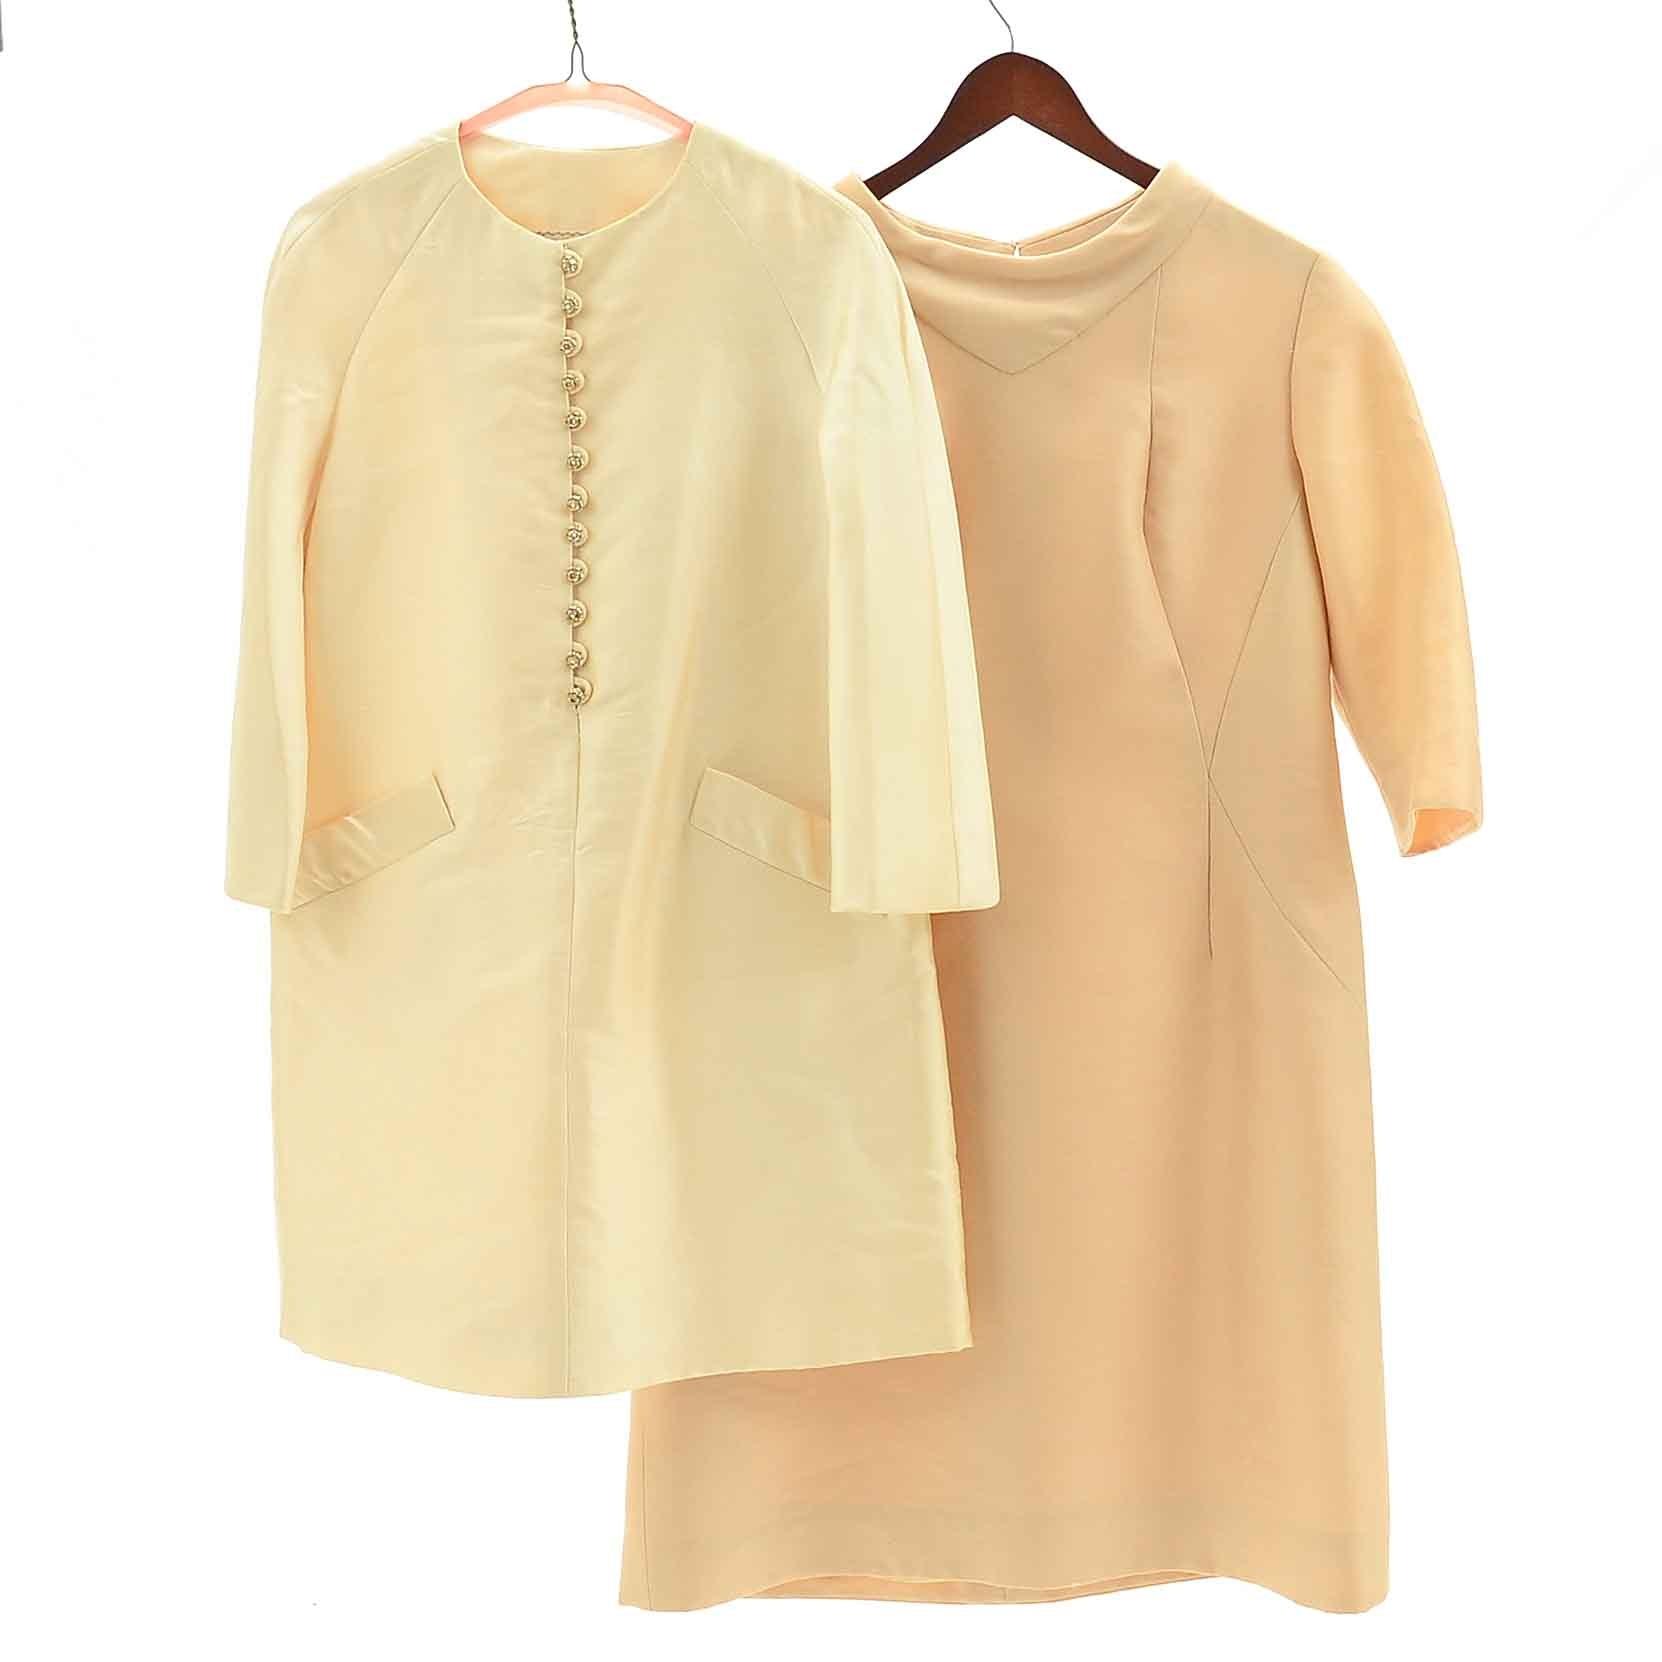 Vintage 1960s Silk Dresses